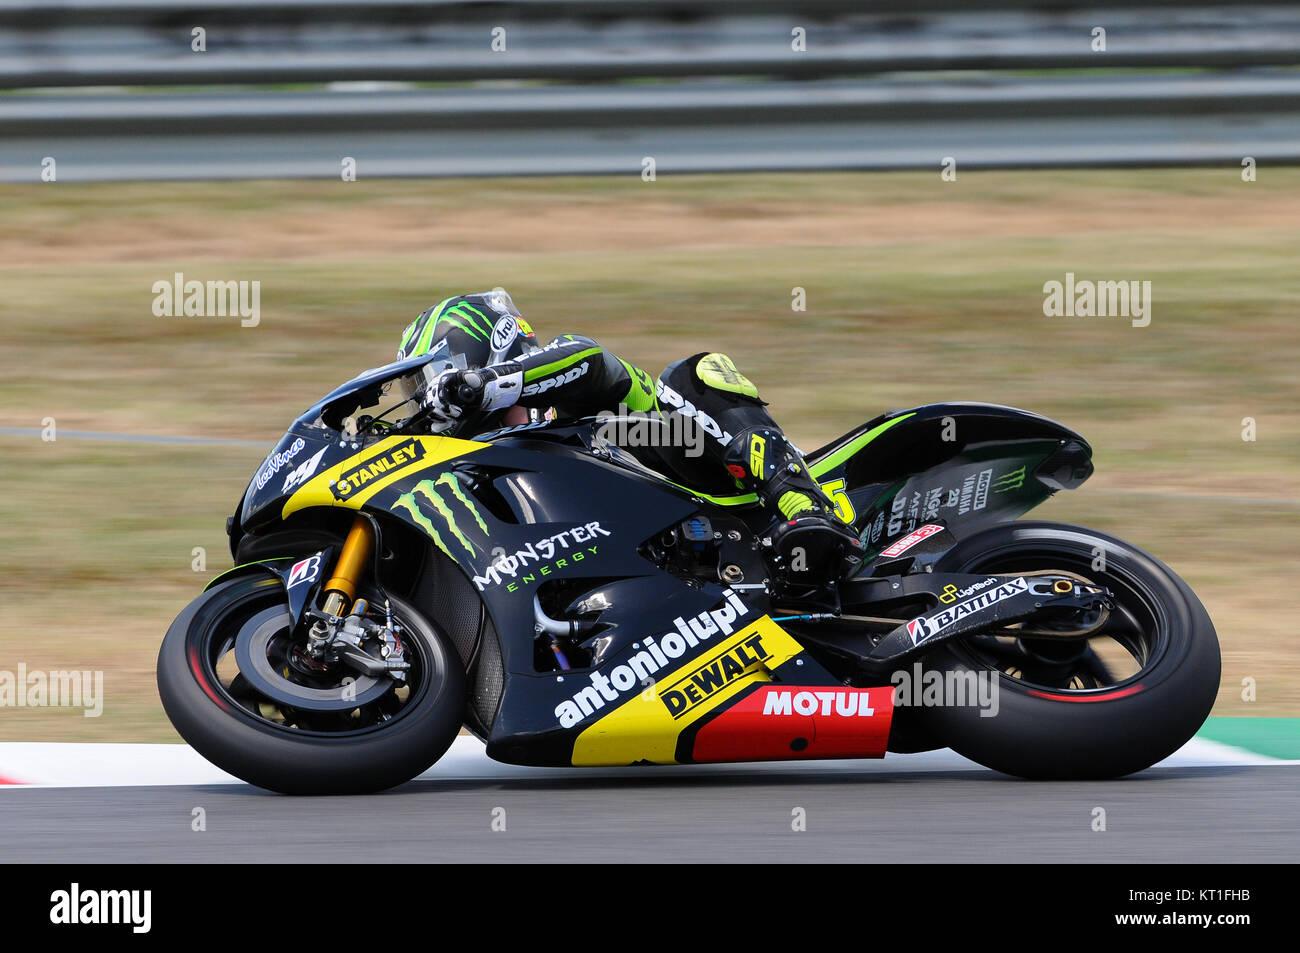 MUGELLO - ITALY, JULY 13, 2012: British Yamaha rider Cal Crutchlow during Qualify Session Grand Prix TIM of Italy Stock Photo